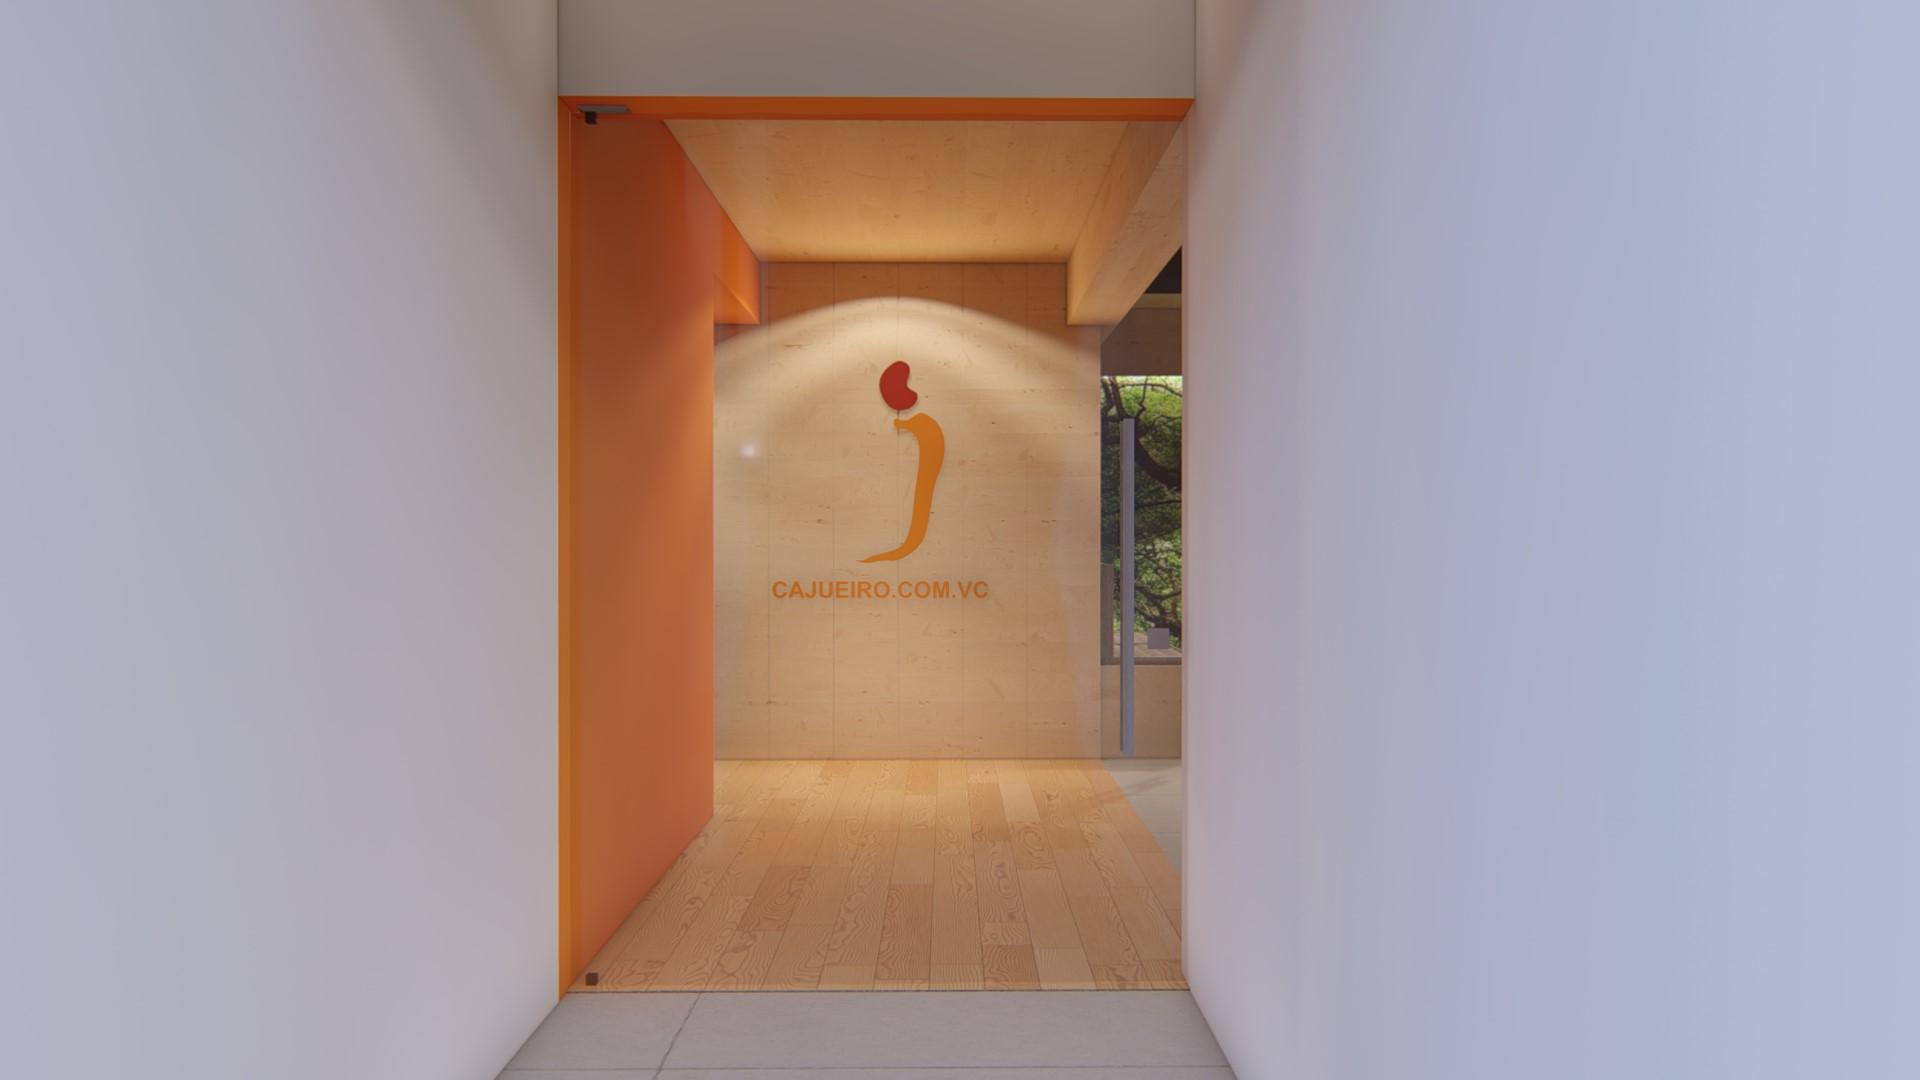 projeto-arquitetonico-cajueiro-duo-arquitetura-011.jpg